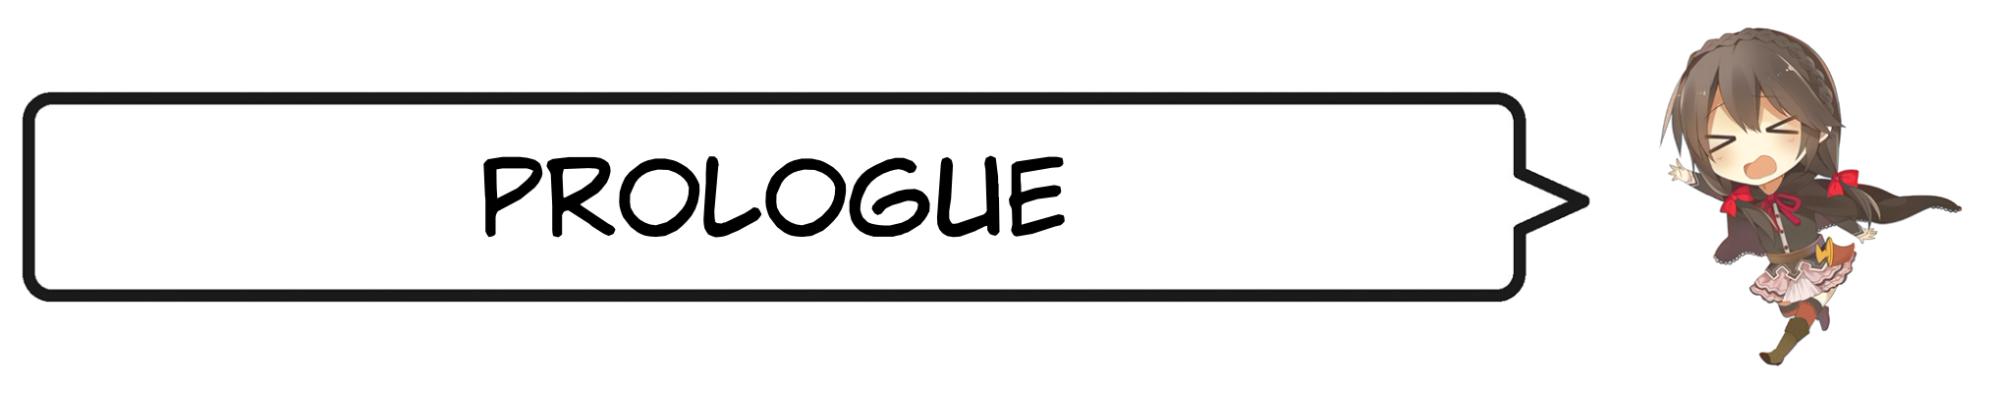 Prologuev2.png